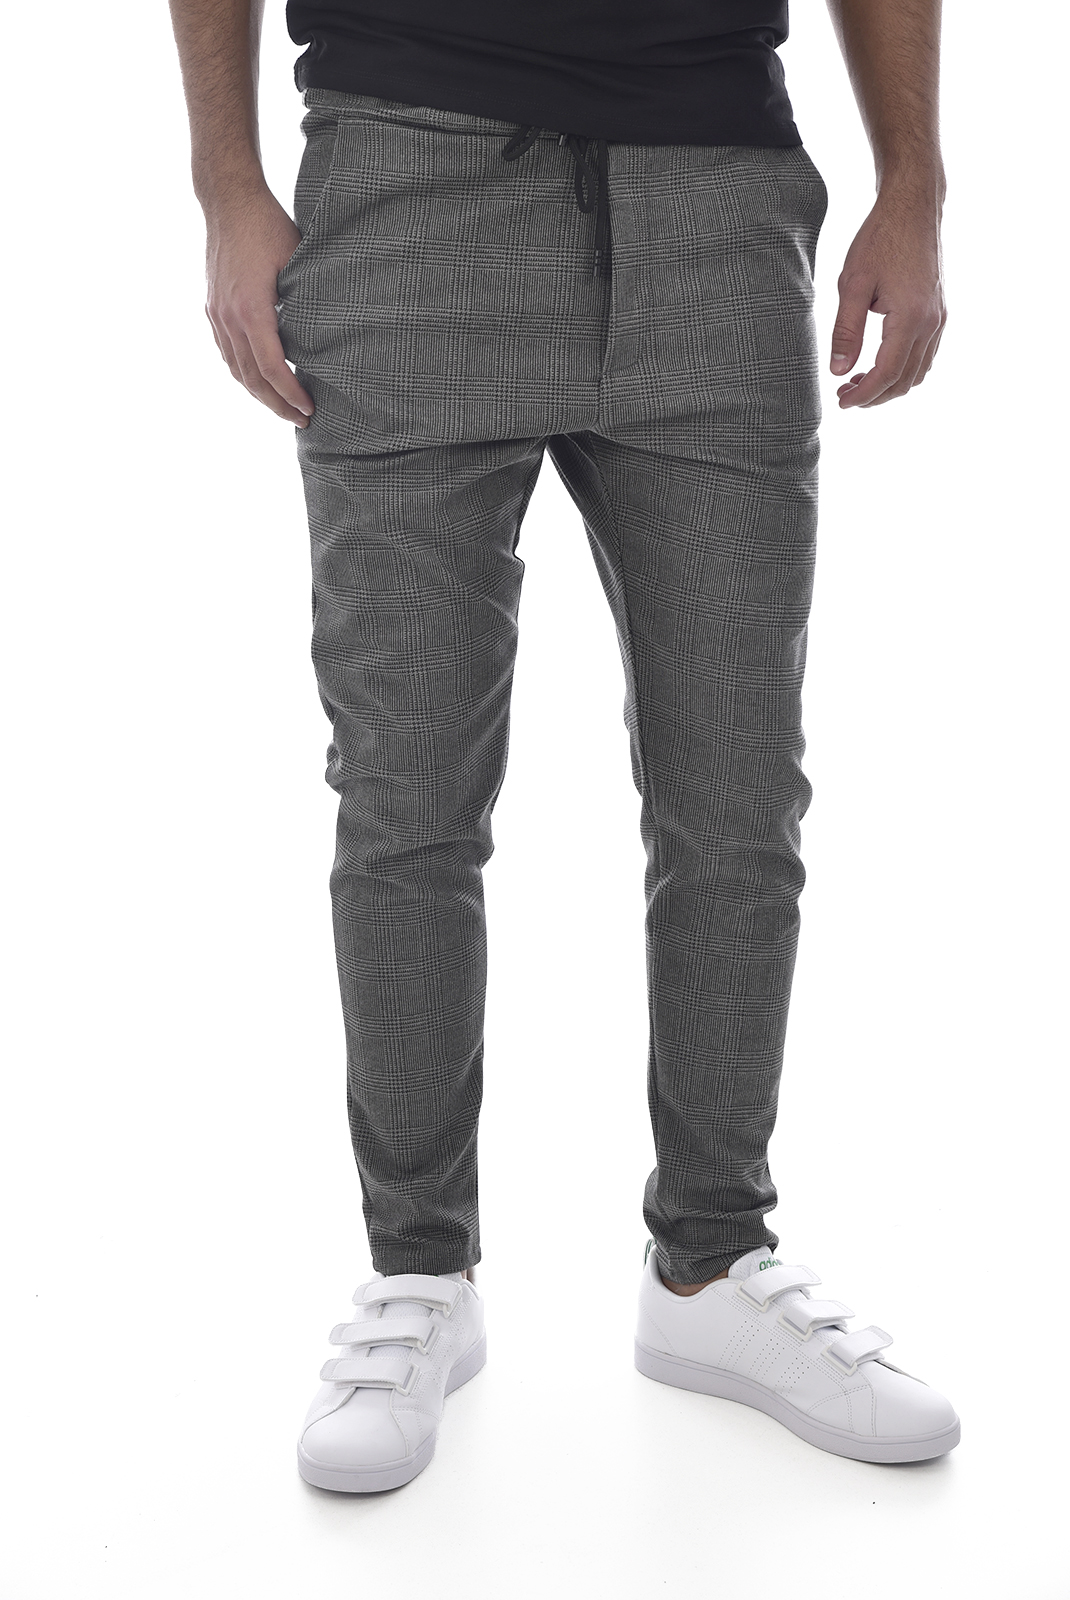 Pantalons sport/streetwear  Made in Italy TM0007.12 GRIS RAYE